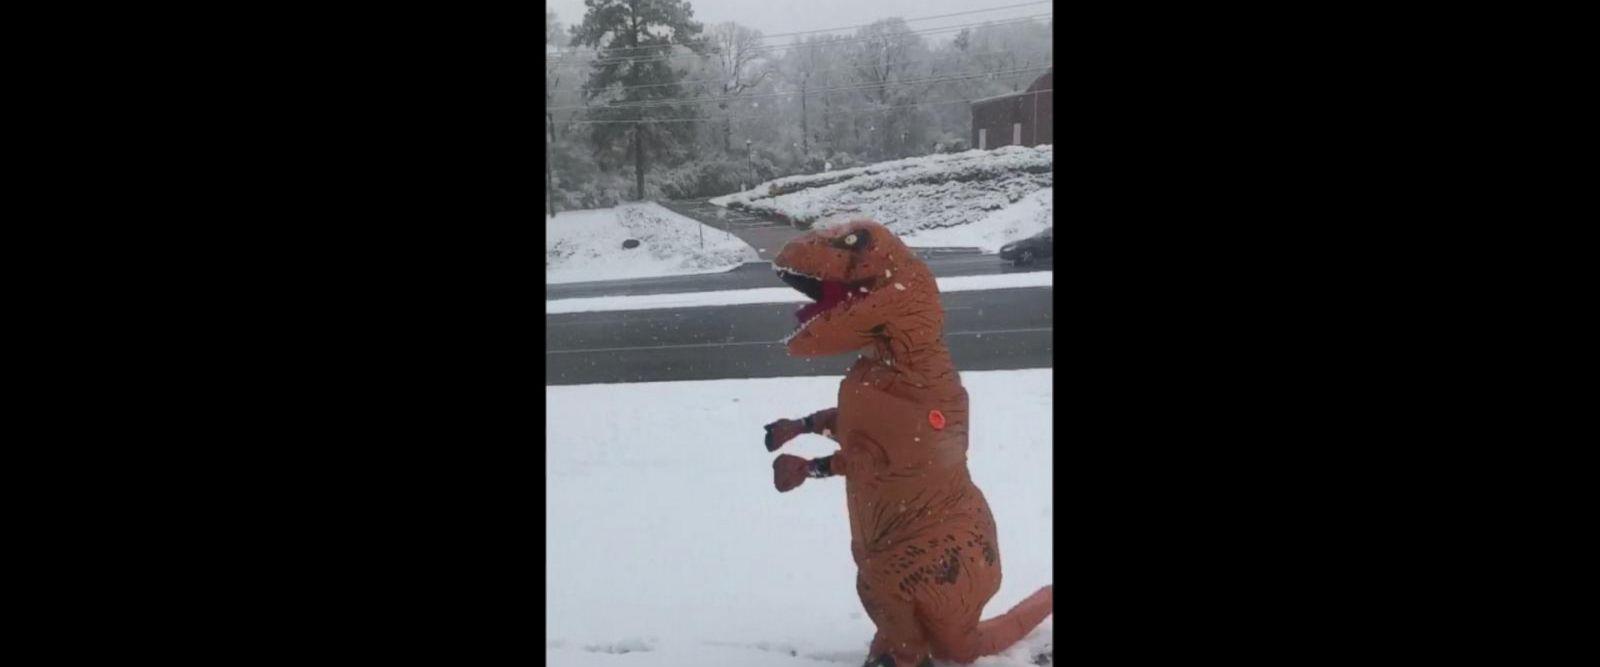 VIDEO: T-Rex enjoys first day of snow